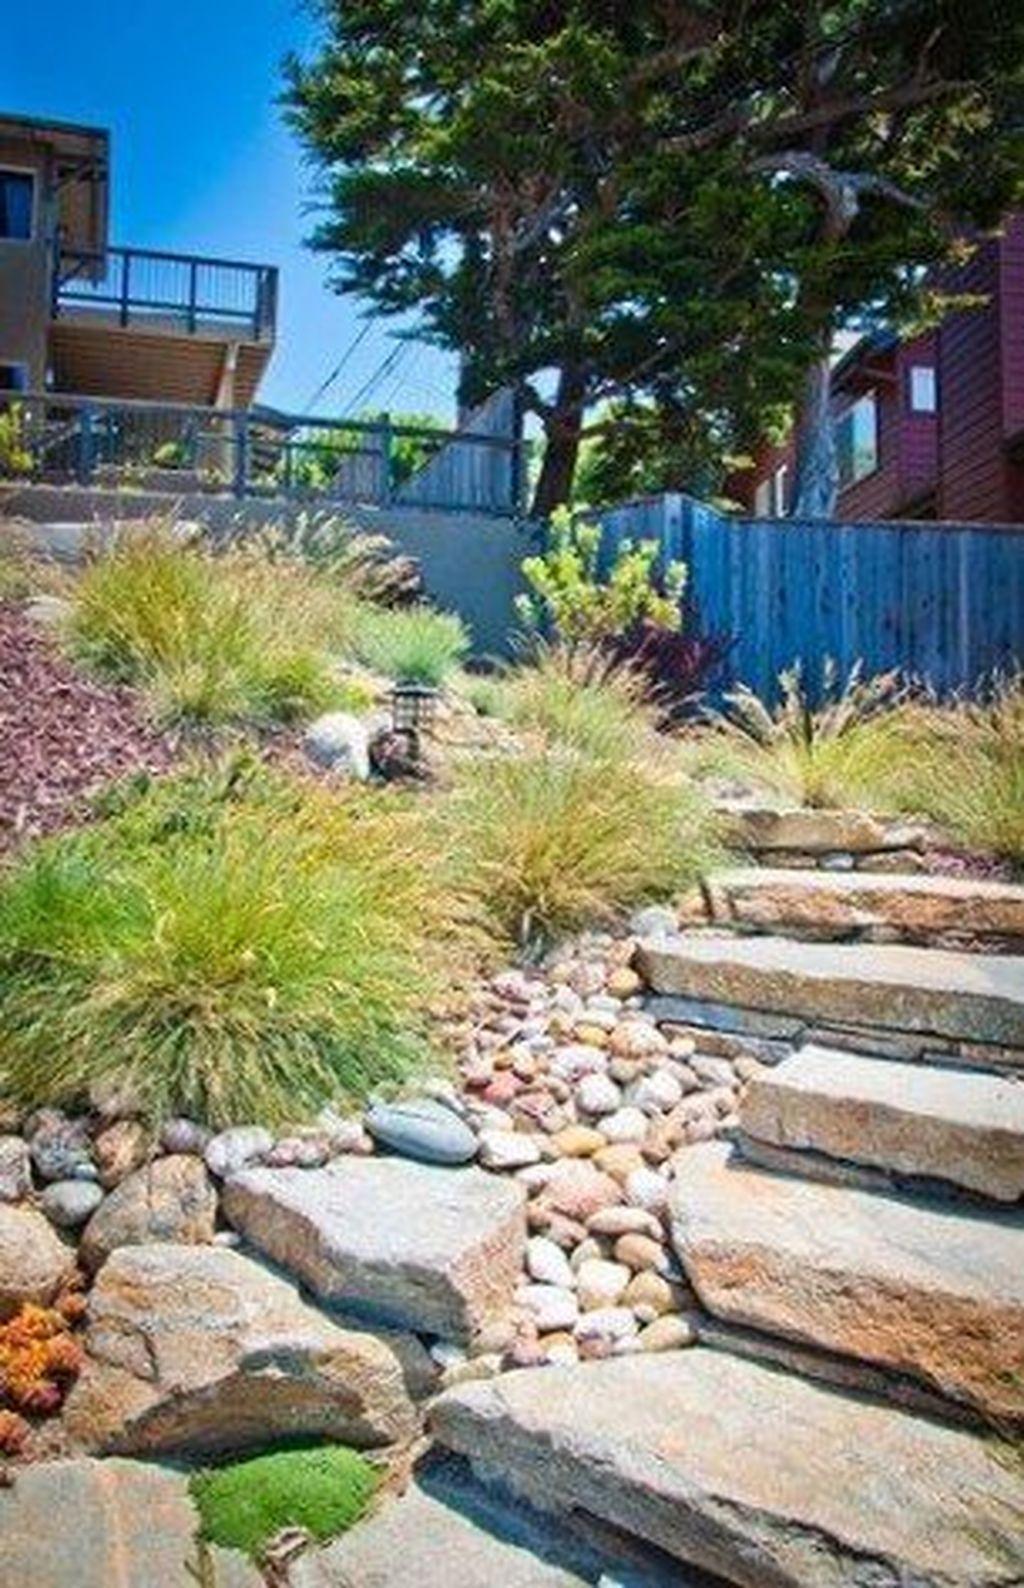 48 Outstanding River Rocks Design Ideas For Front Yard Landscapes #riverrocklandscaping 48 Outstanding River Rocks Design Ideas For Front Yard Landscapes #riverrocklandscaping